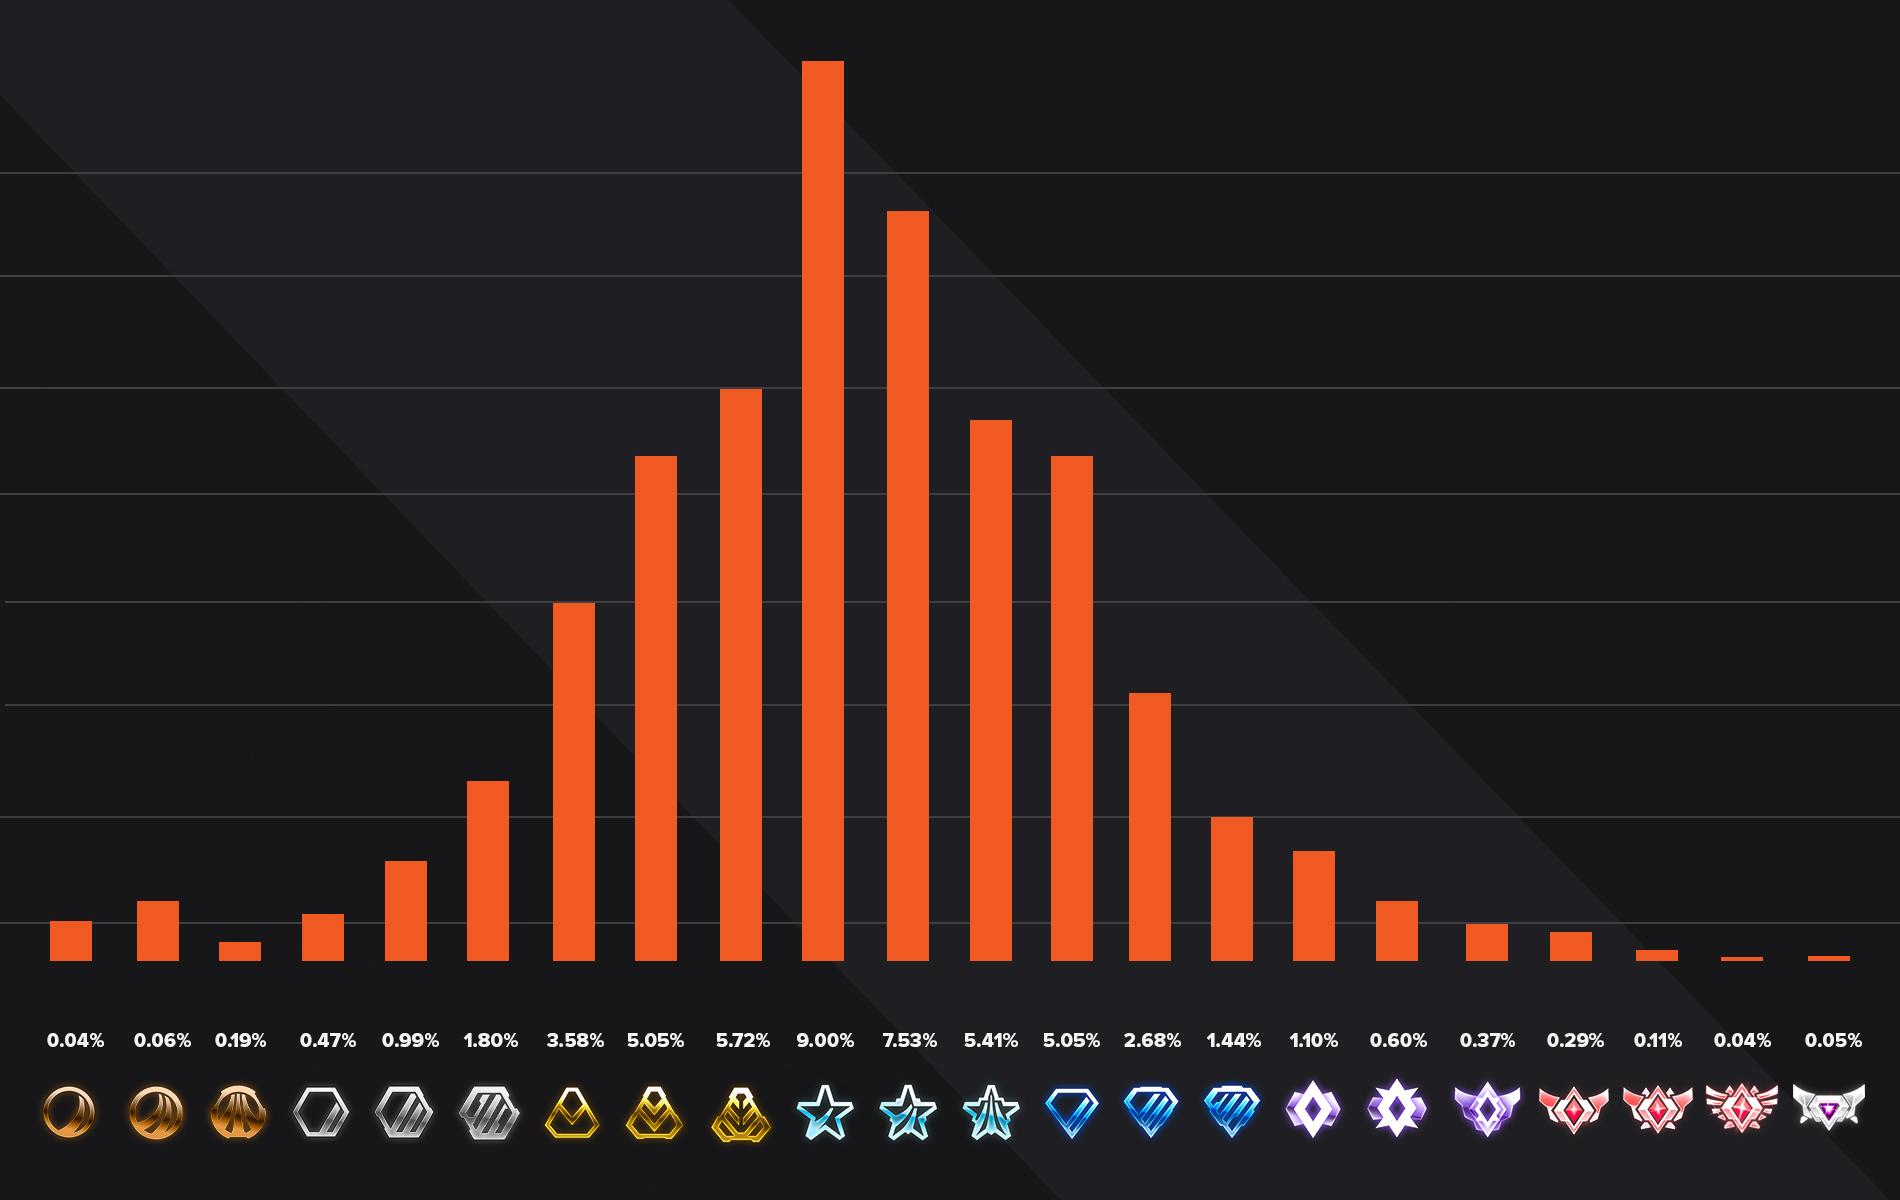 1V1 rocket league ranks distribution